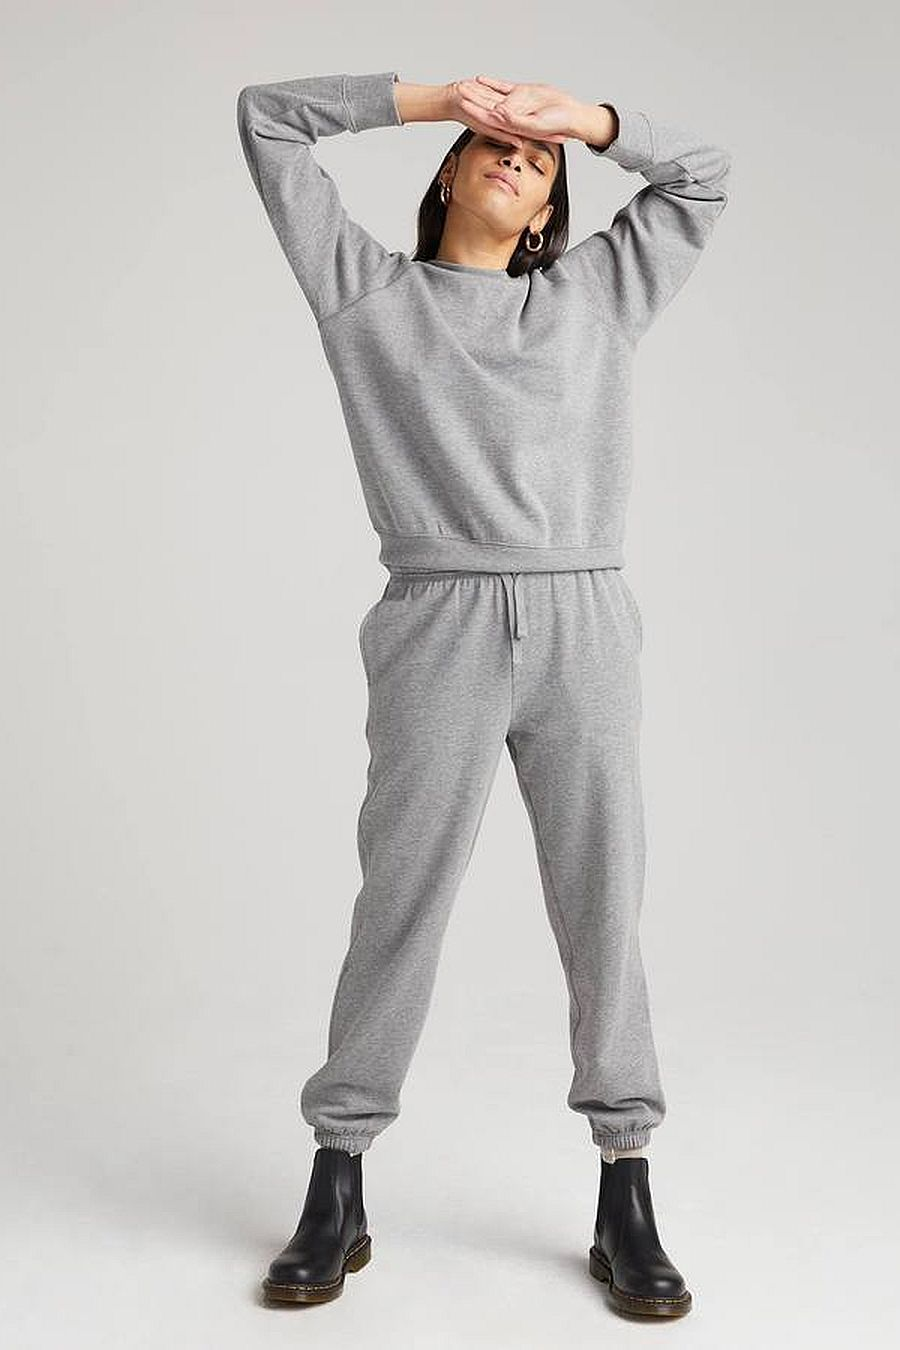 Richer Poorer Recycled Fleece Sweatpant - Heather Grey